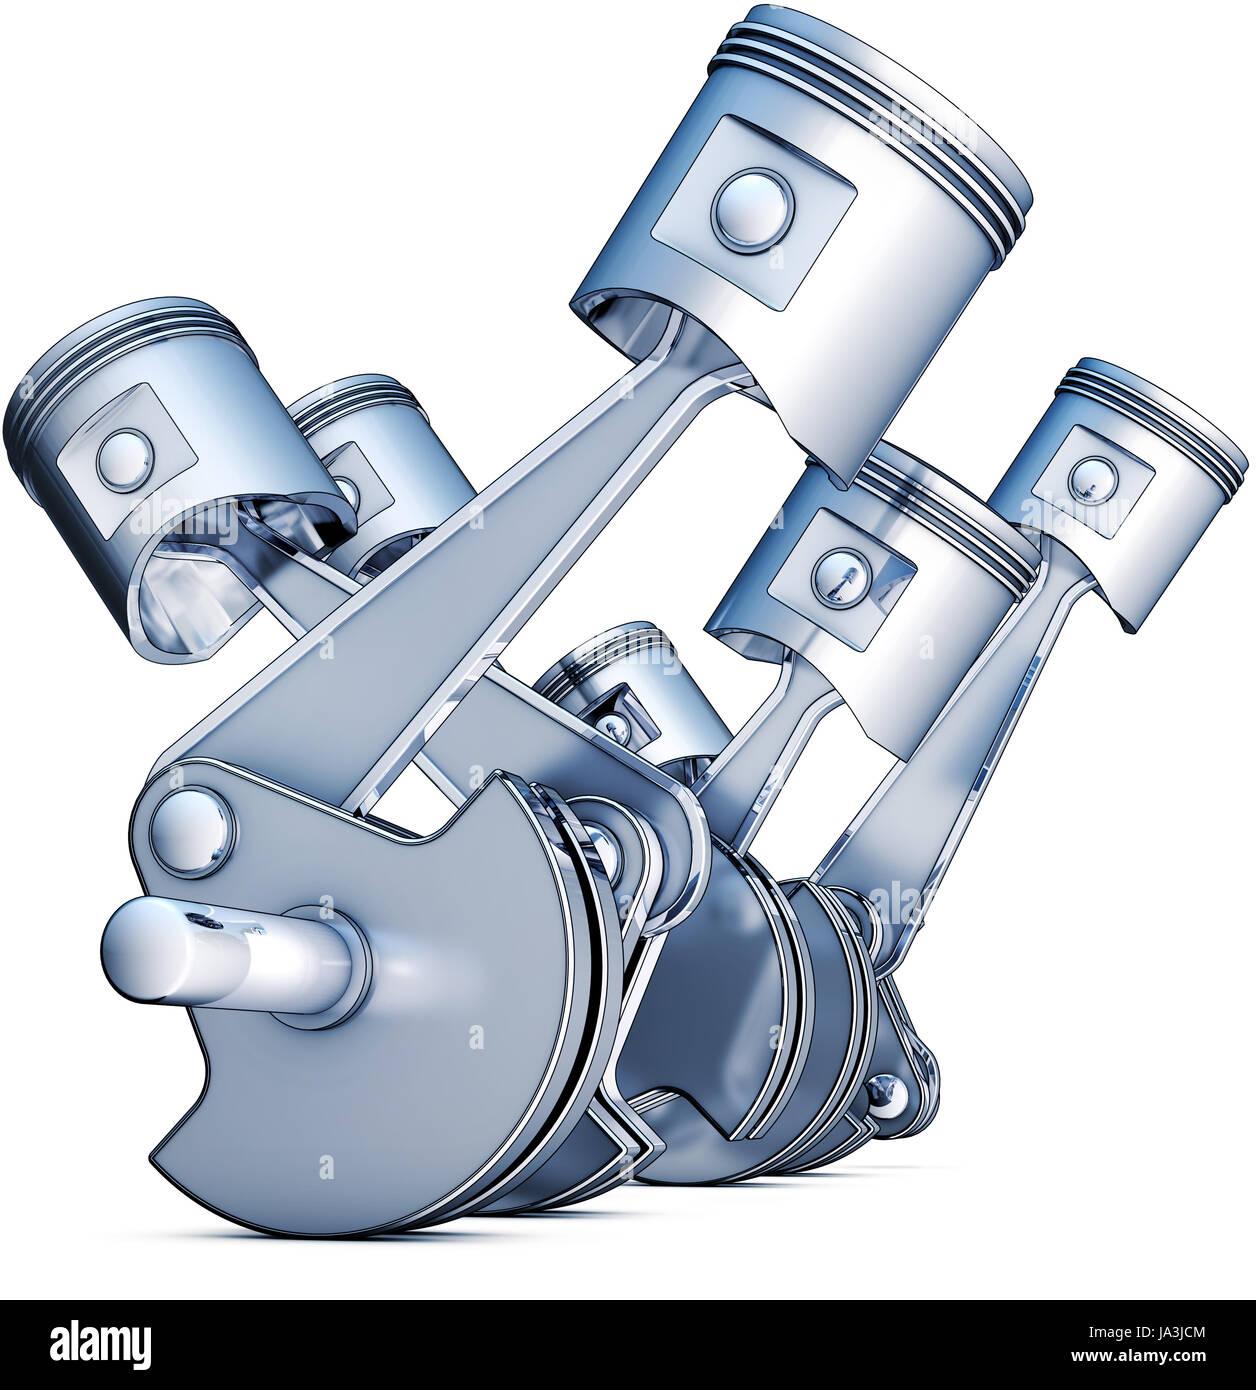 engine, drive, motor, motoring, piston, petrol, economic situation, economy, - Stock Image